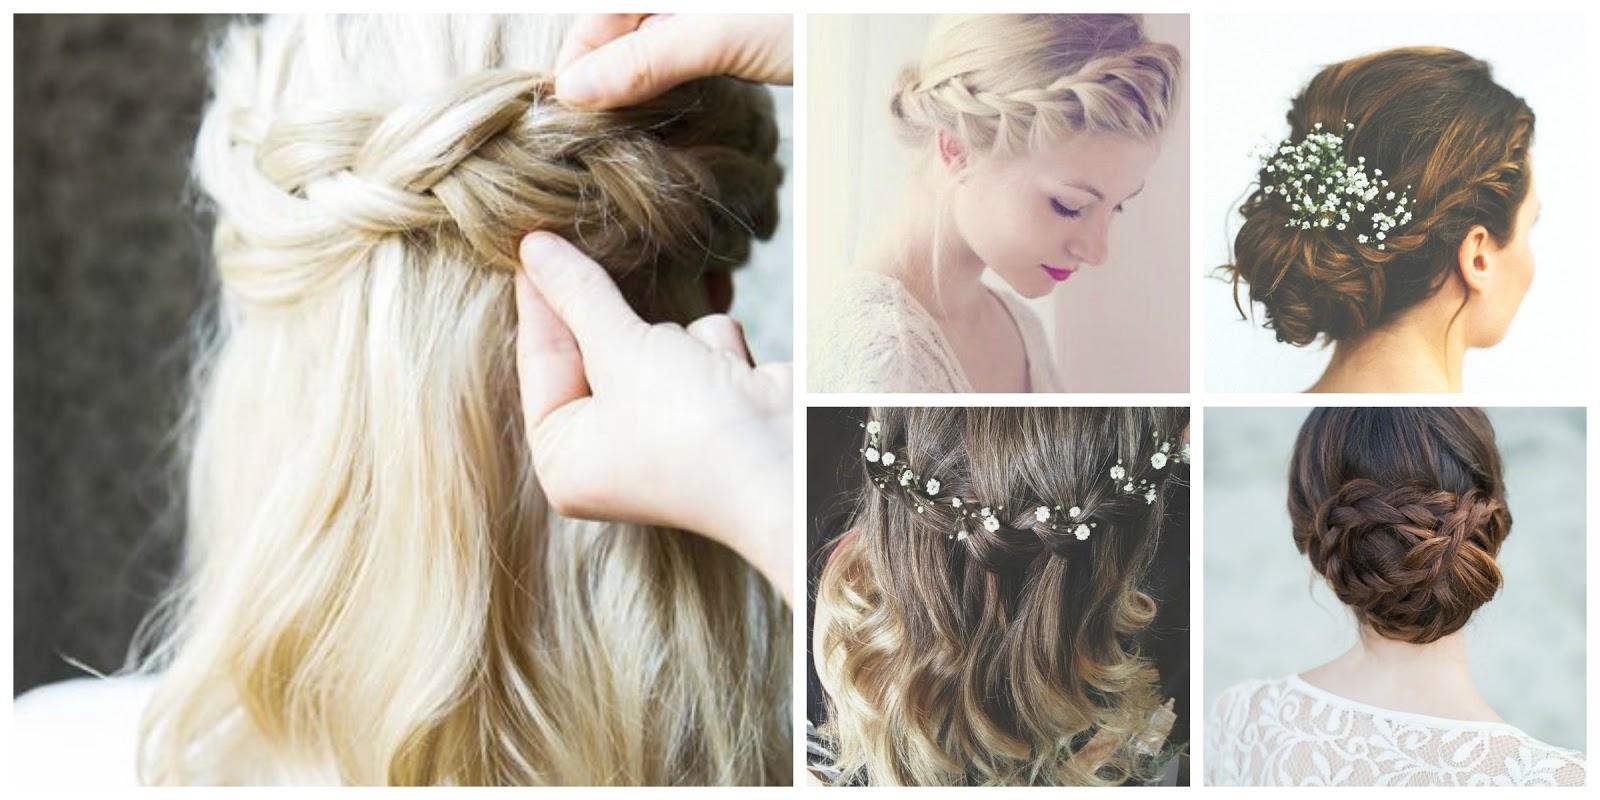 redheads and royalty: bridal hair inspiration